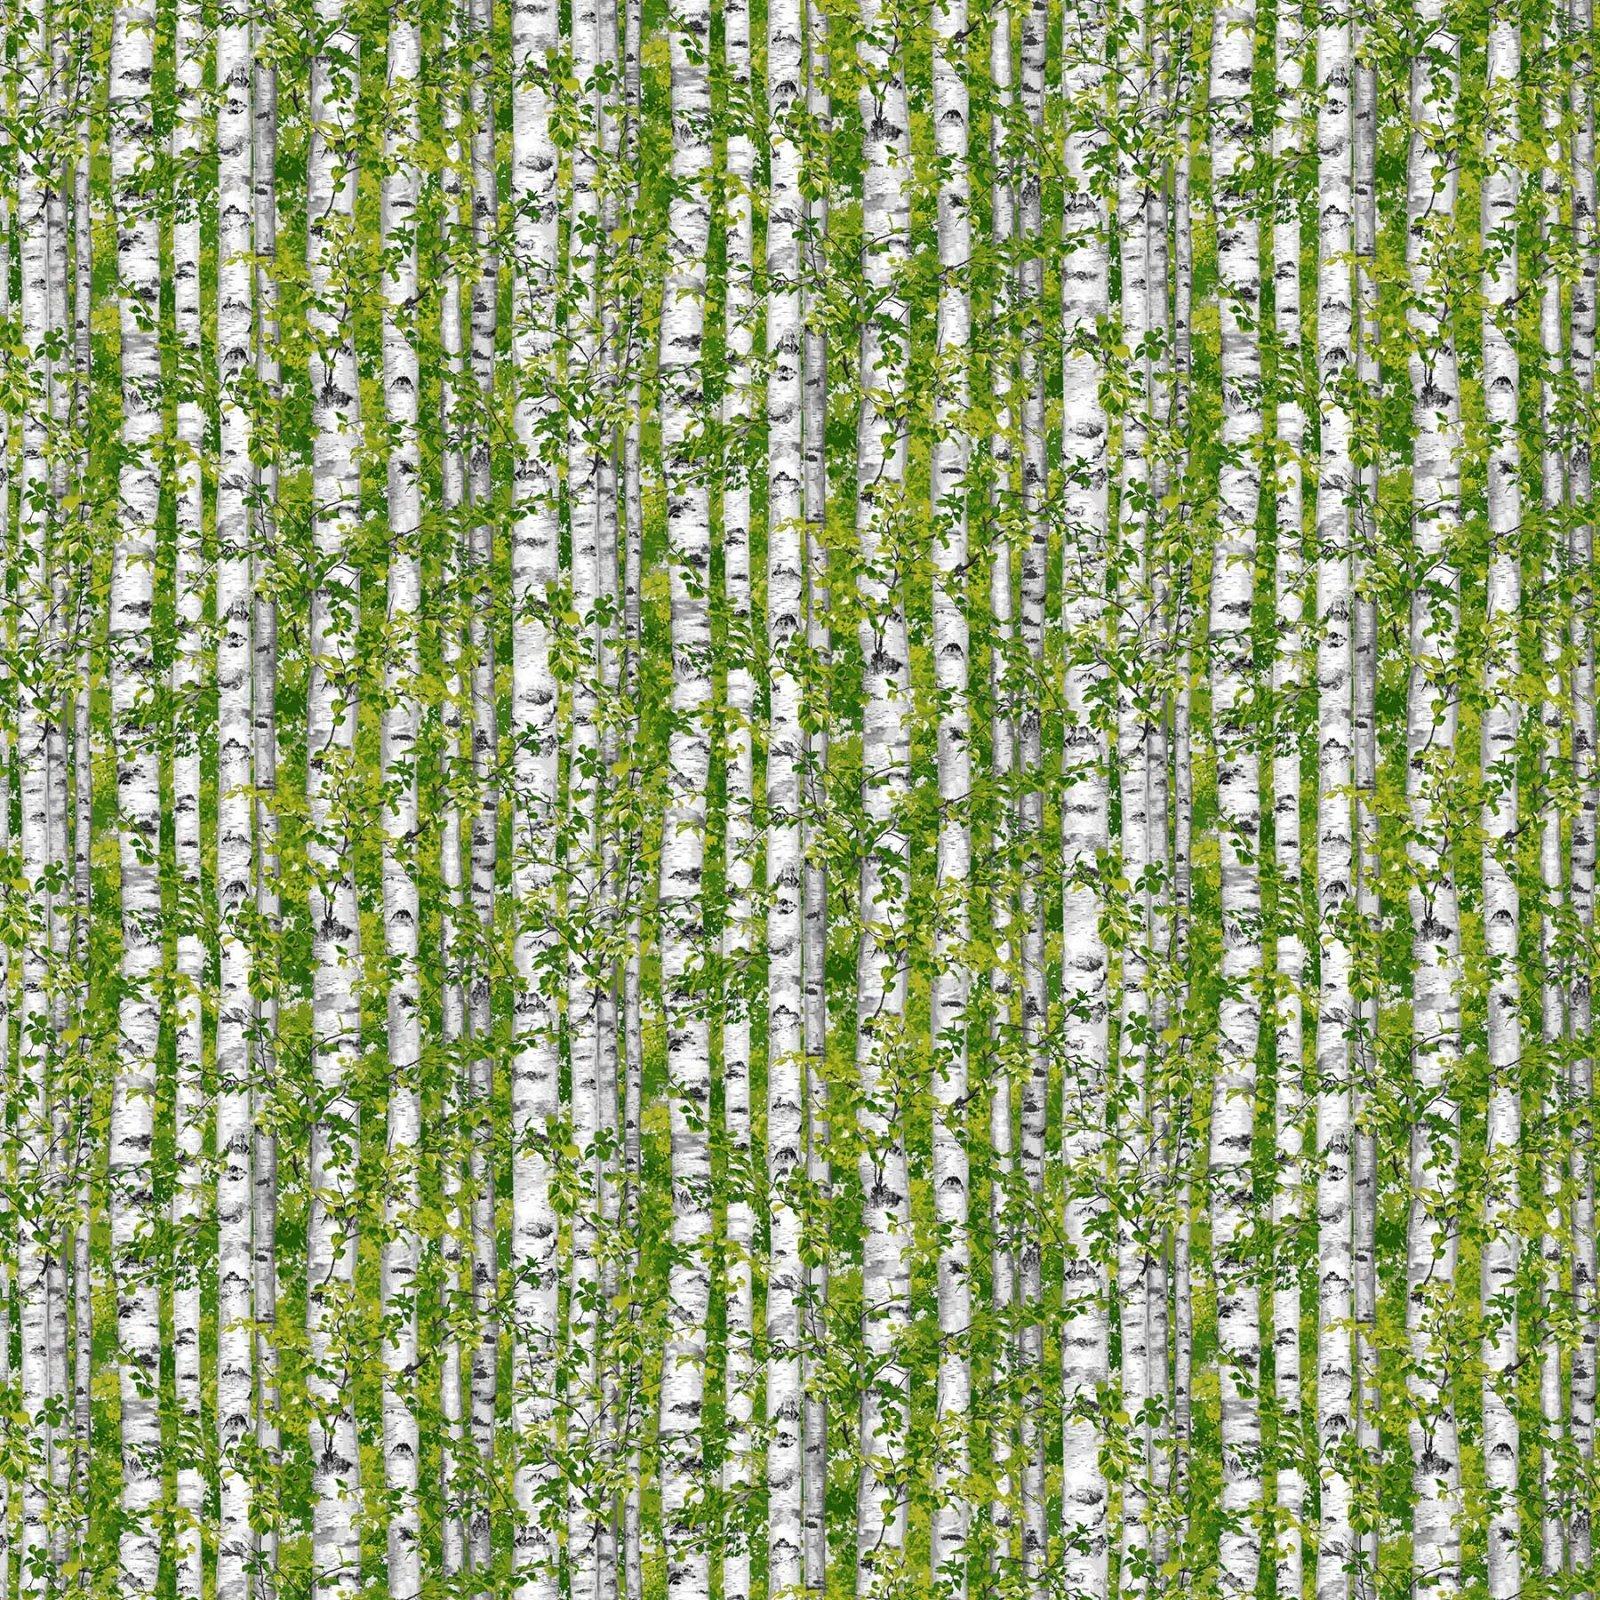 TREES(E-4), 21844-74, NORTHCOTT